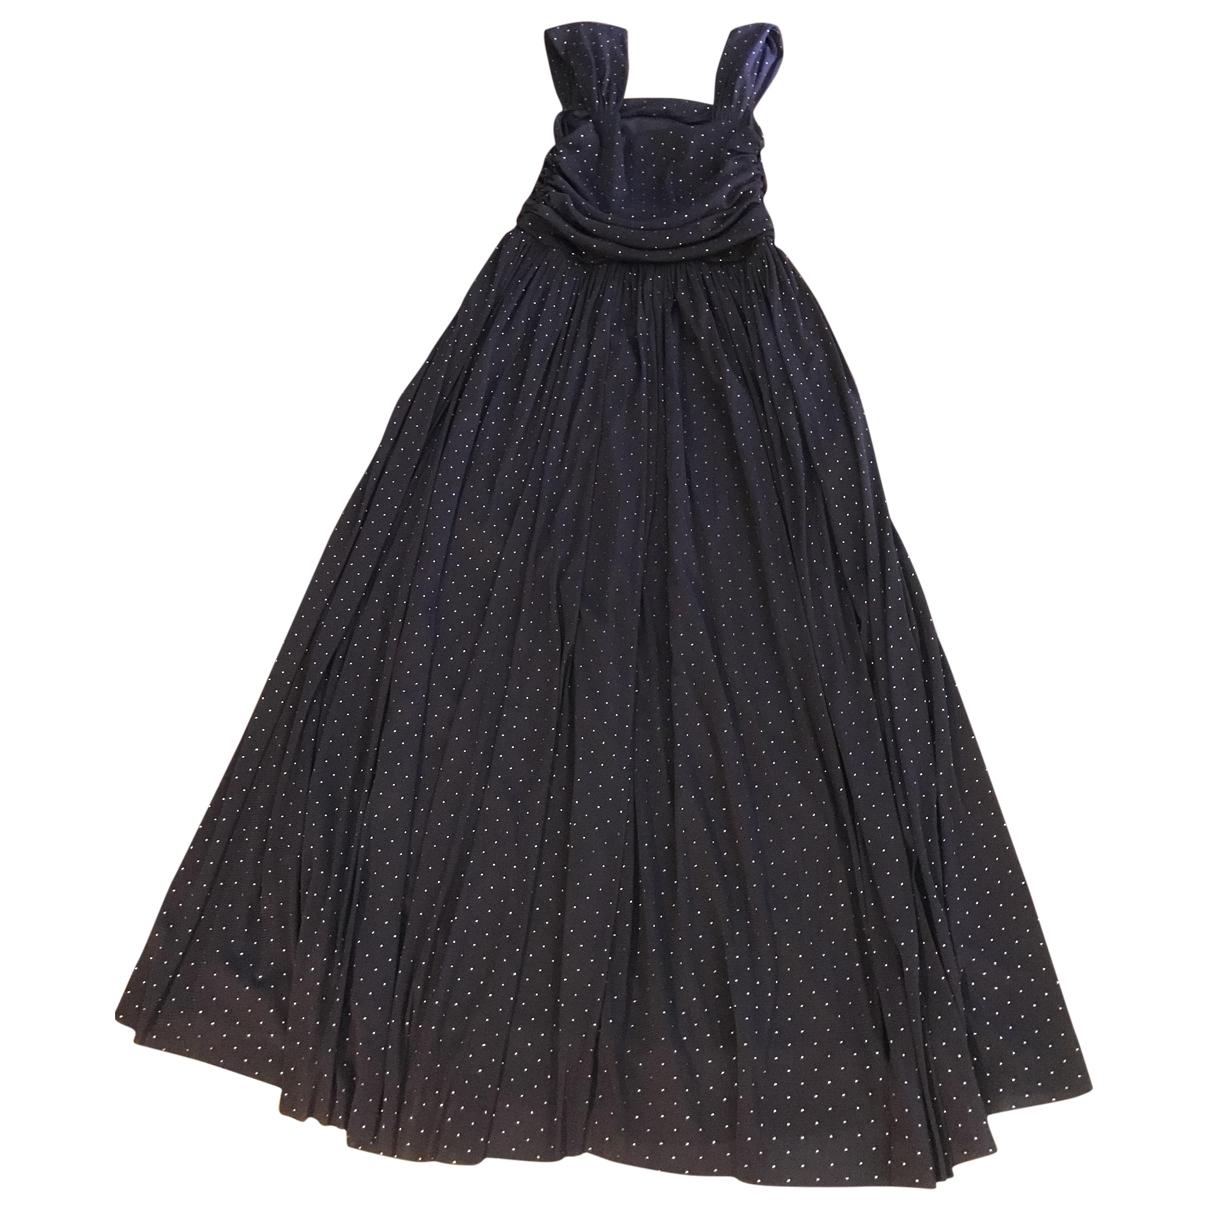 Max & Co \N Burgundy dress for Women M International